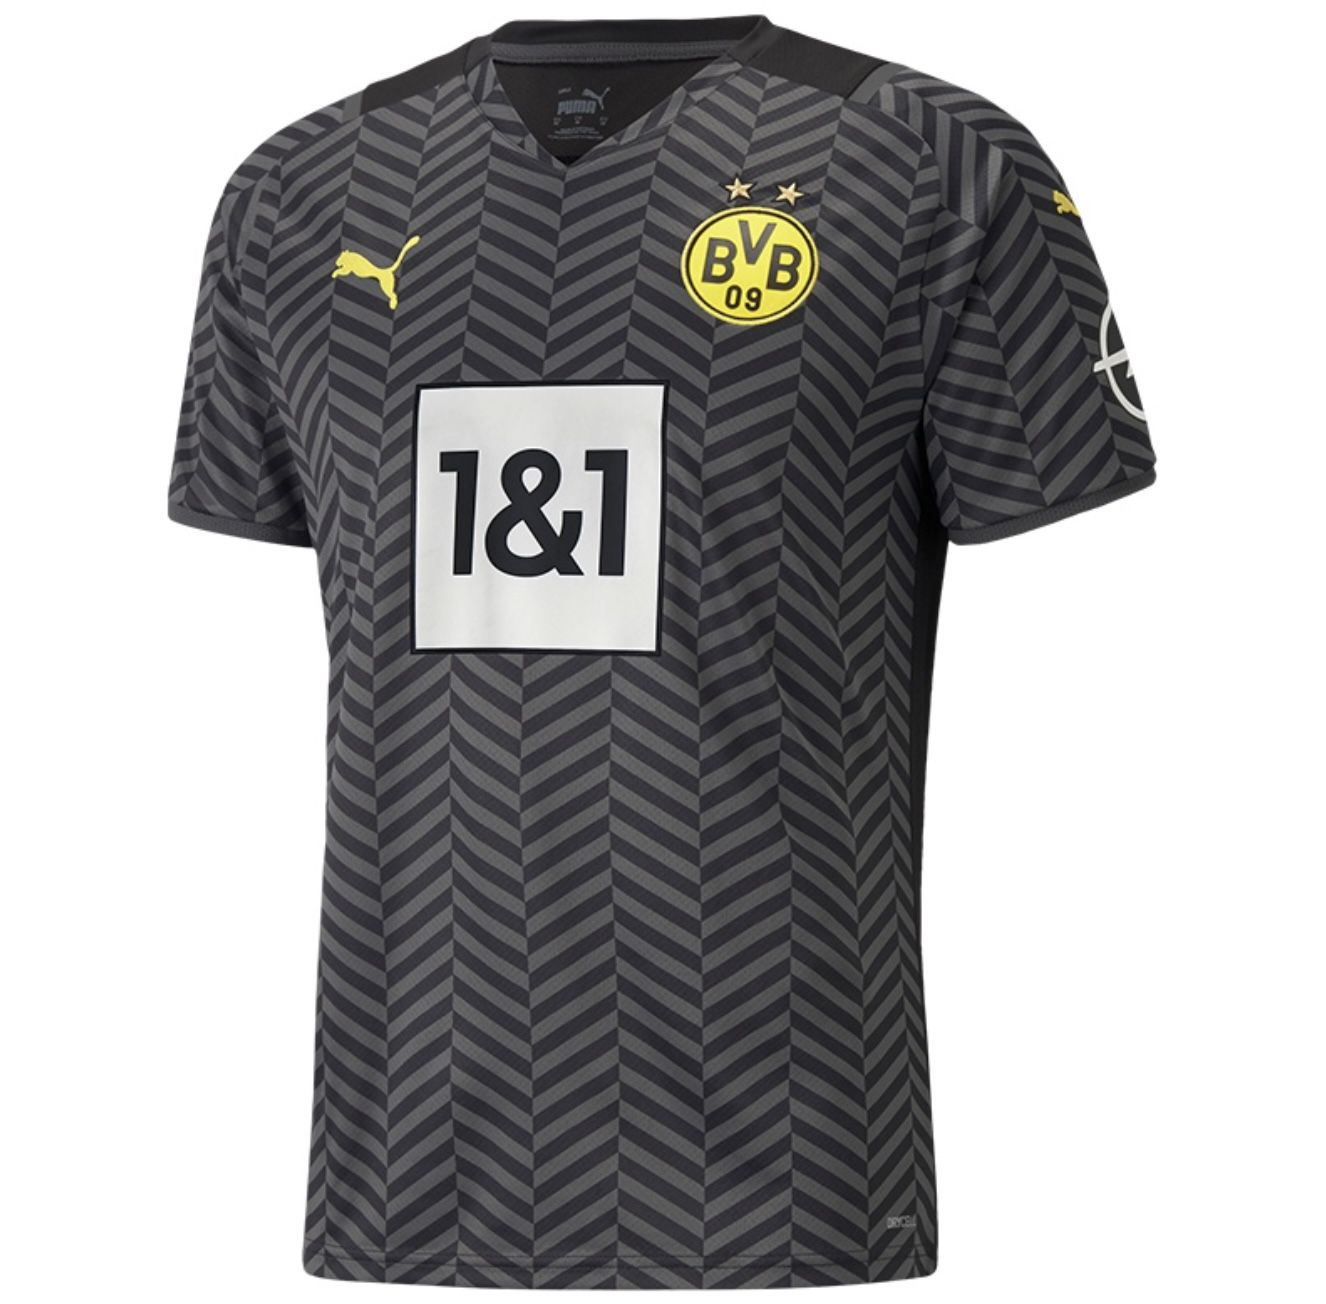 Puma BVB Borussia Dortmund Auswärtstrikot 21/22 für 52,97€ (statt 74€)